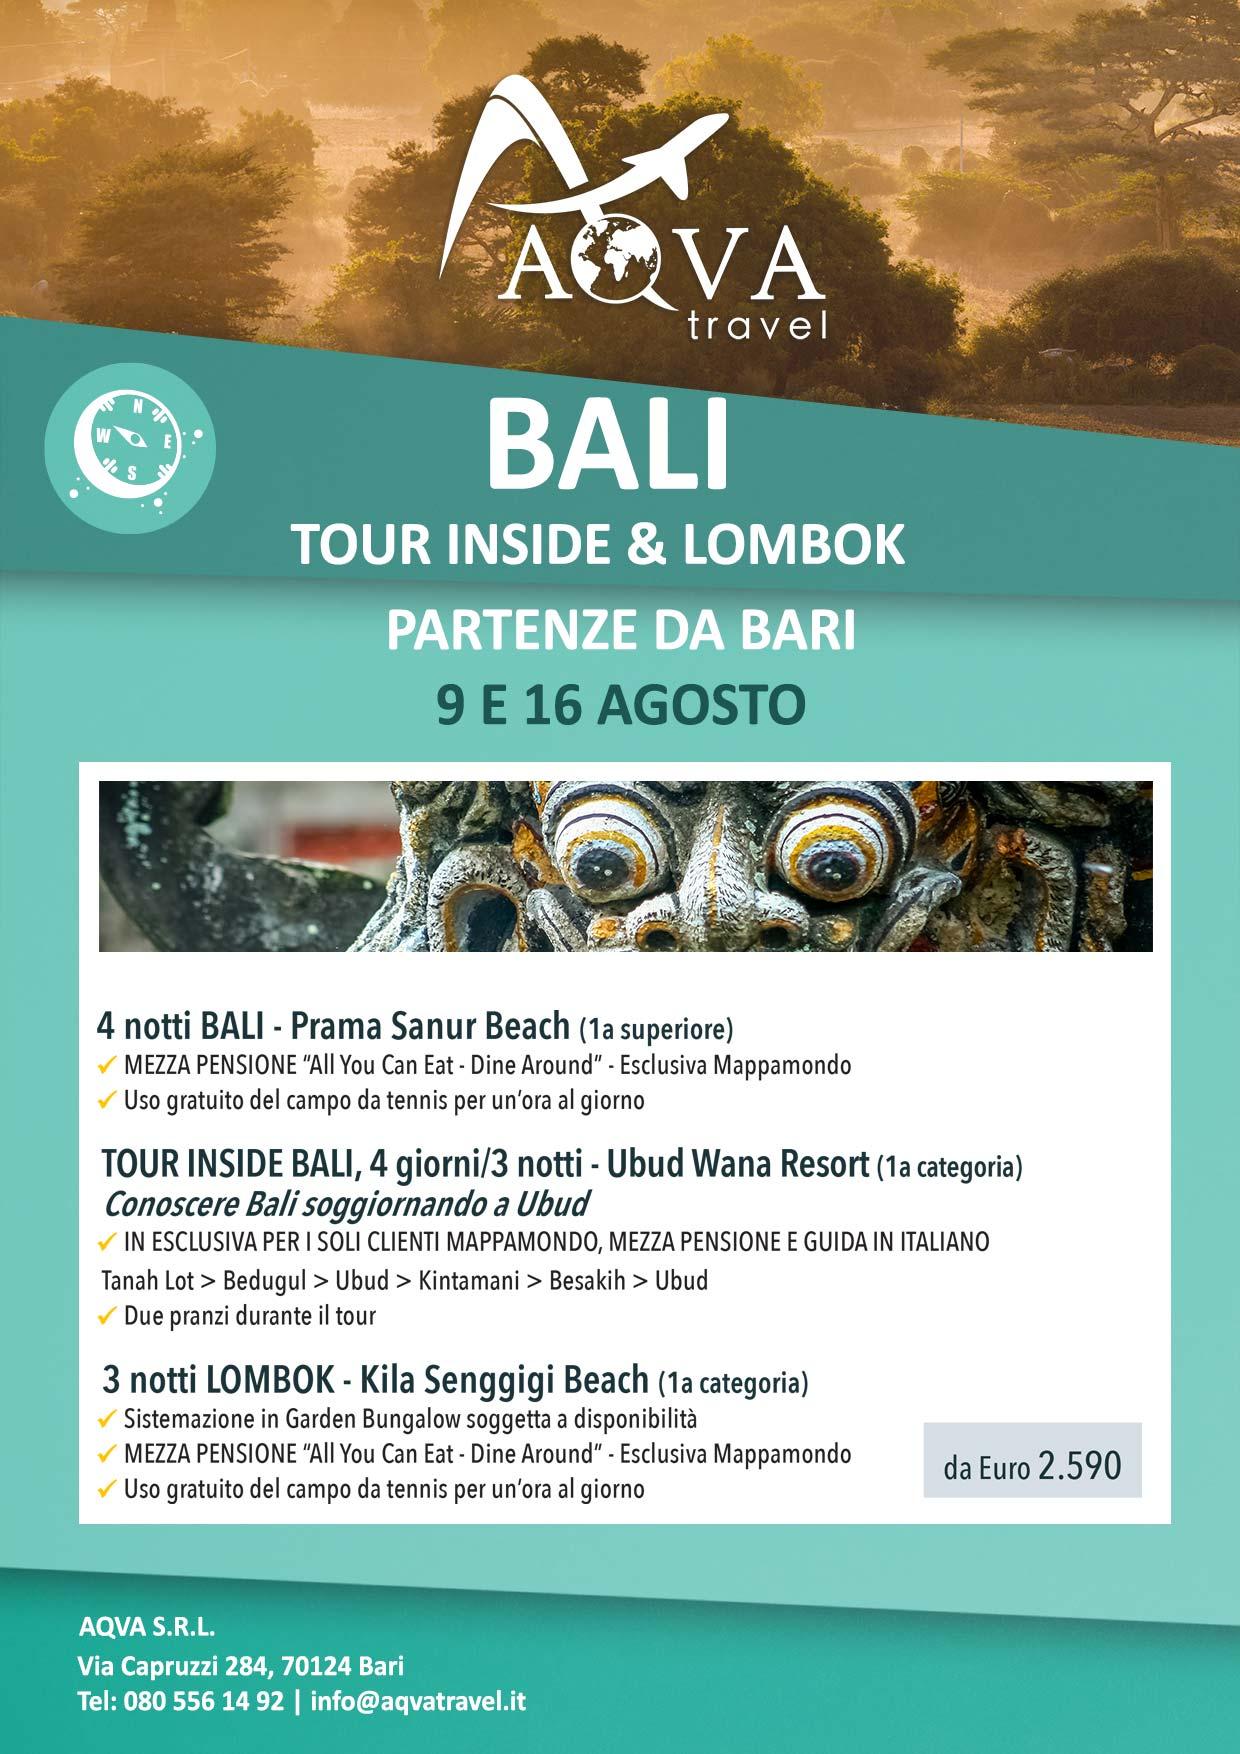 BALI-TOUR-INSIDE-&-LOMBOK---PARTENZE-DA-BARI-Avventura-offerte-agenzia-di-viaggi-Bari-AQVATRAVEL-it